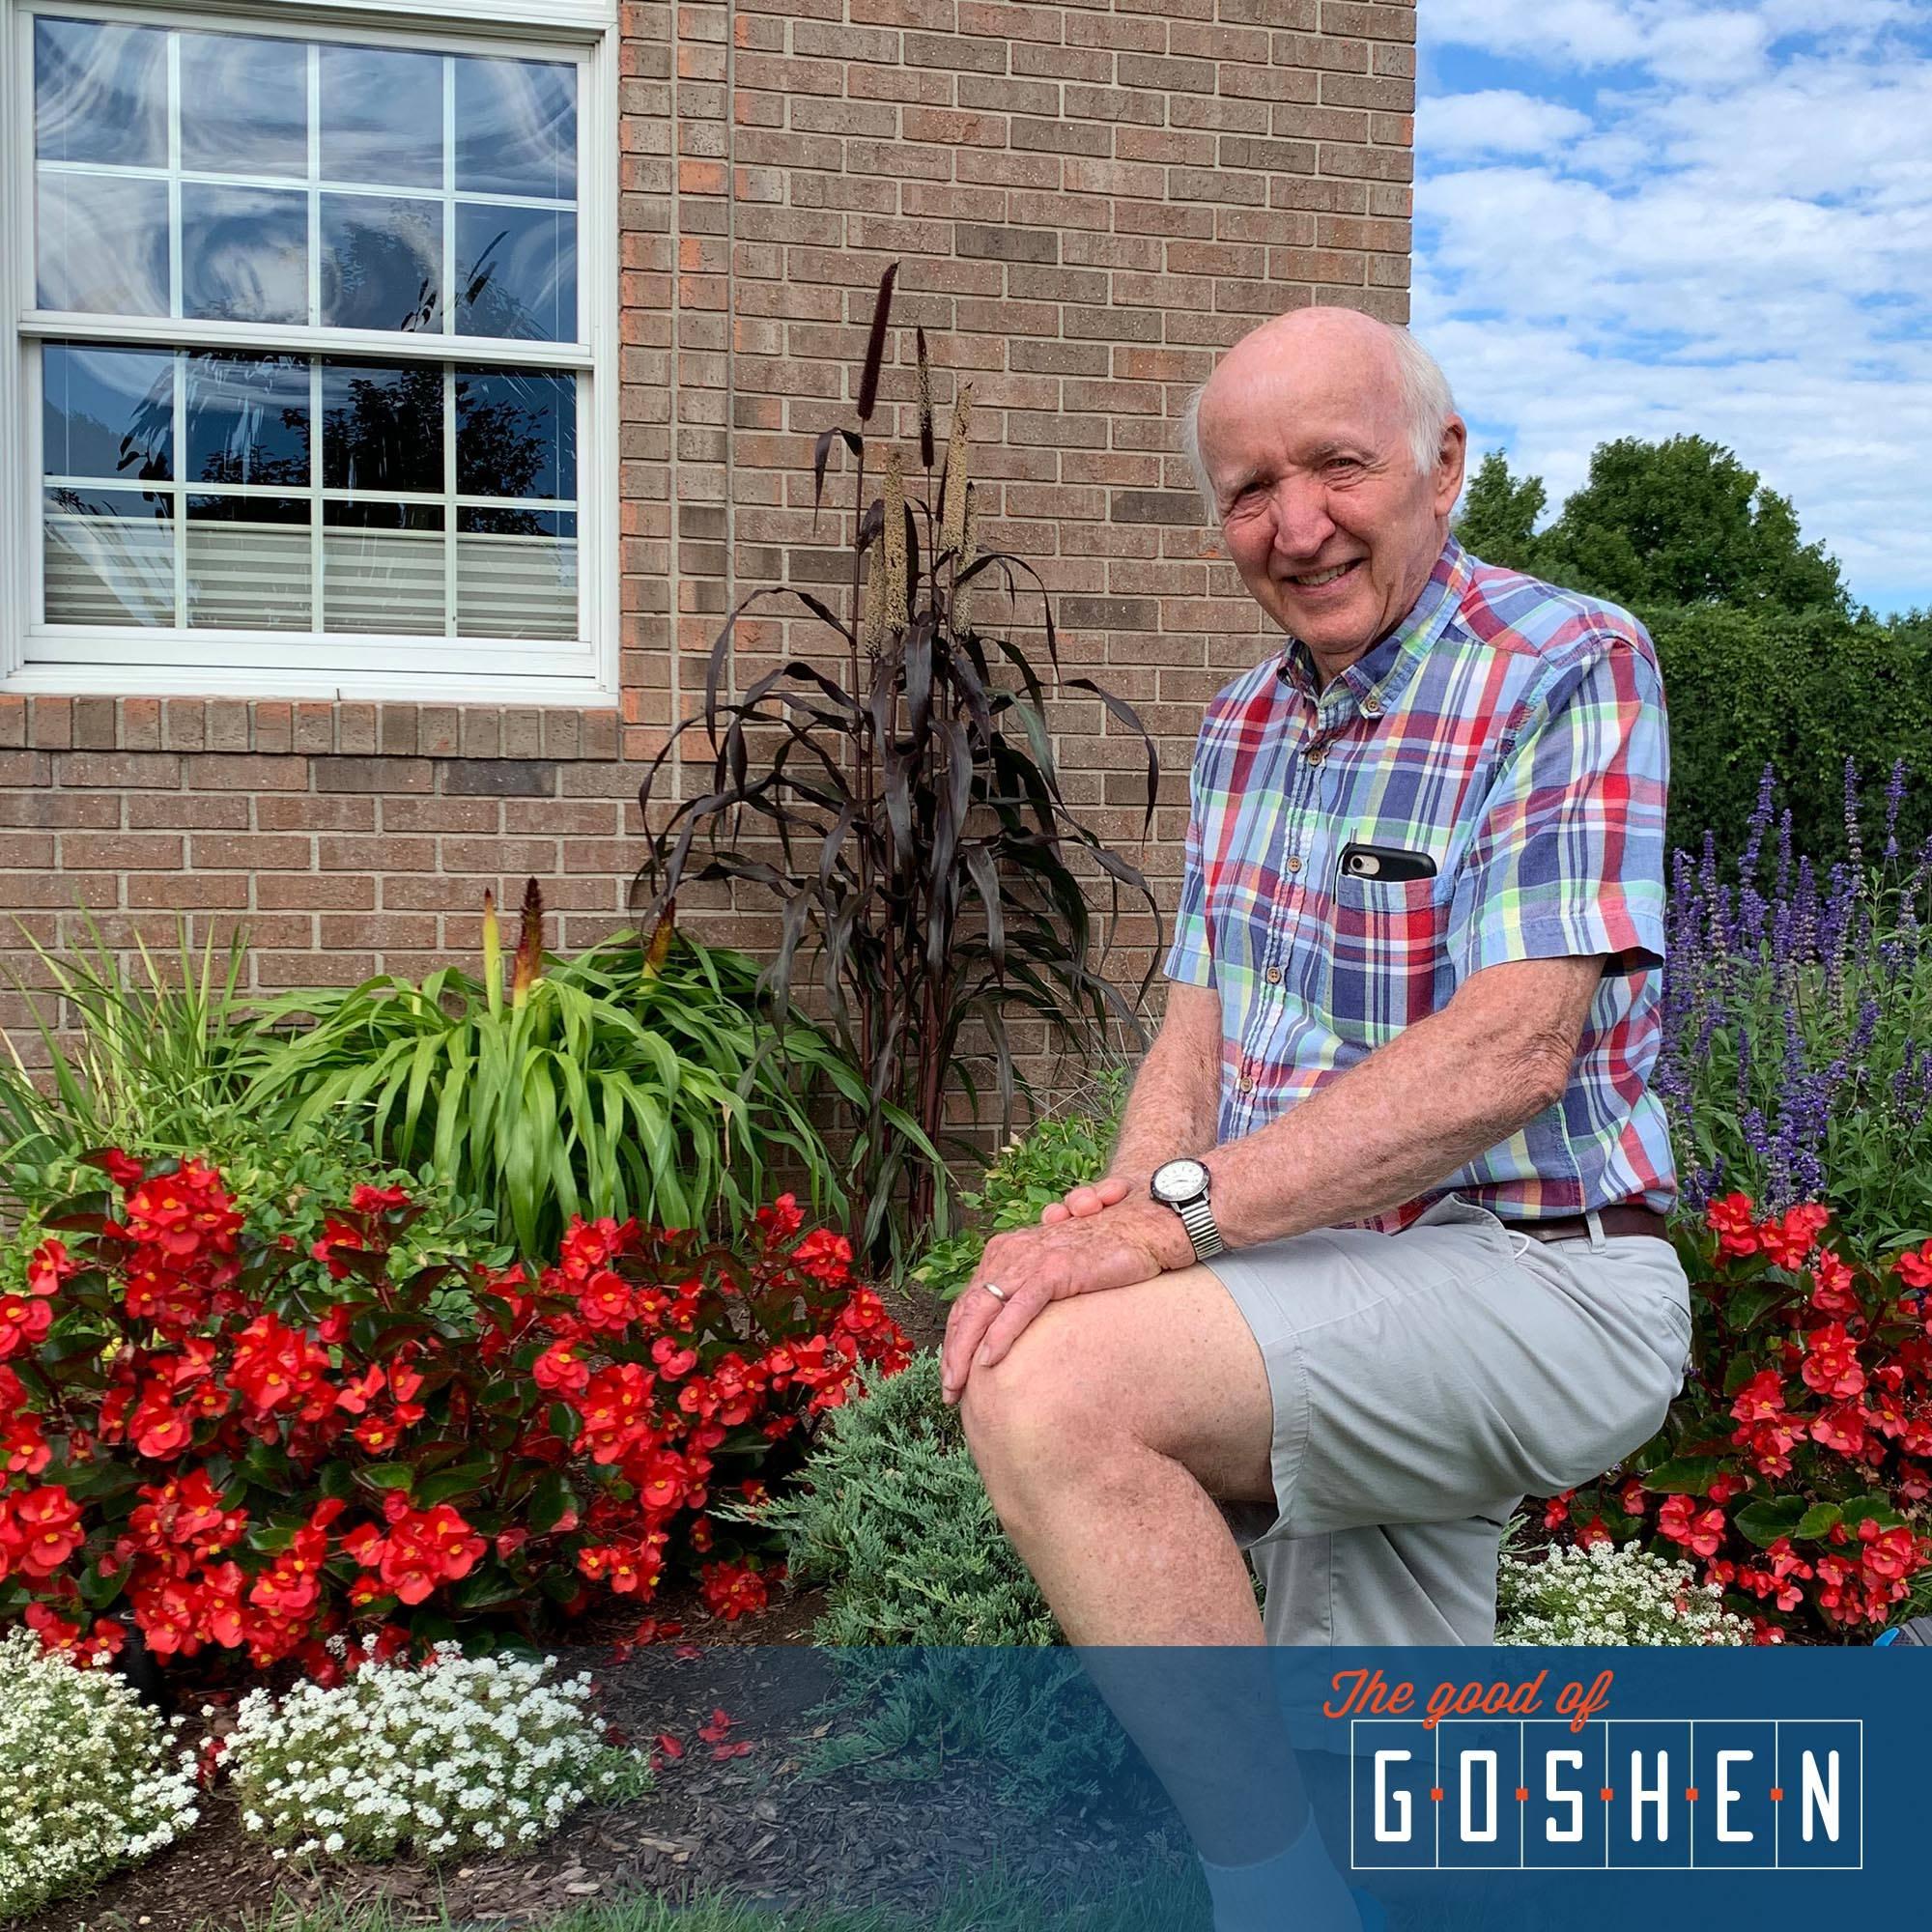 Stan King • The Good of Goshen